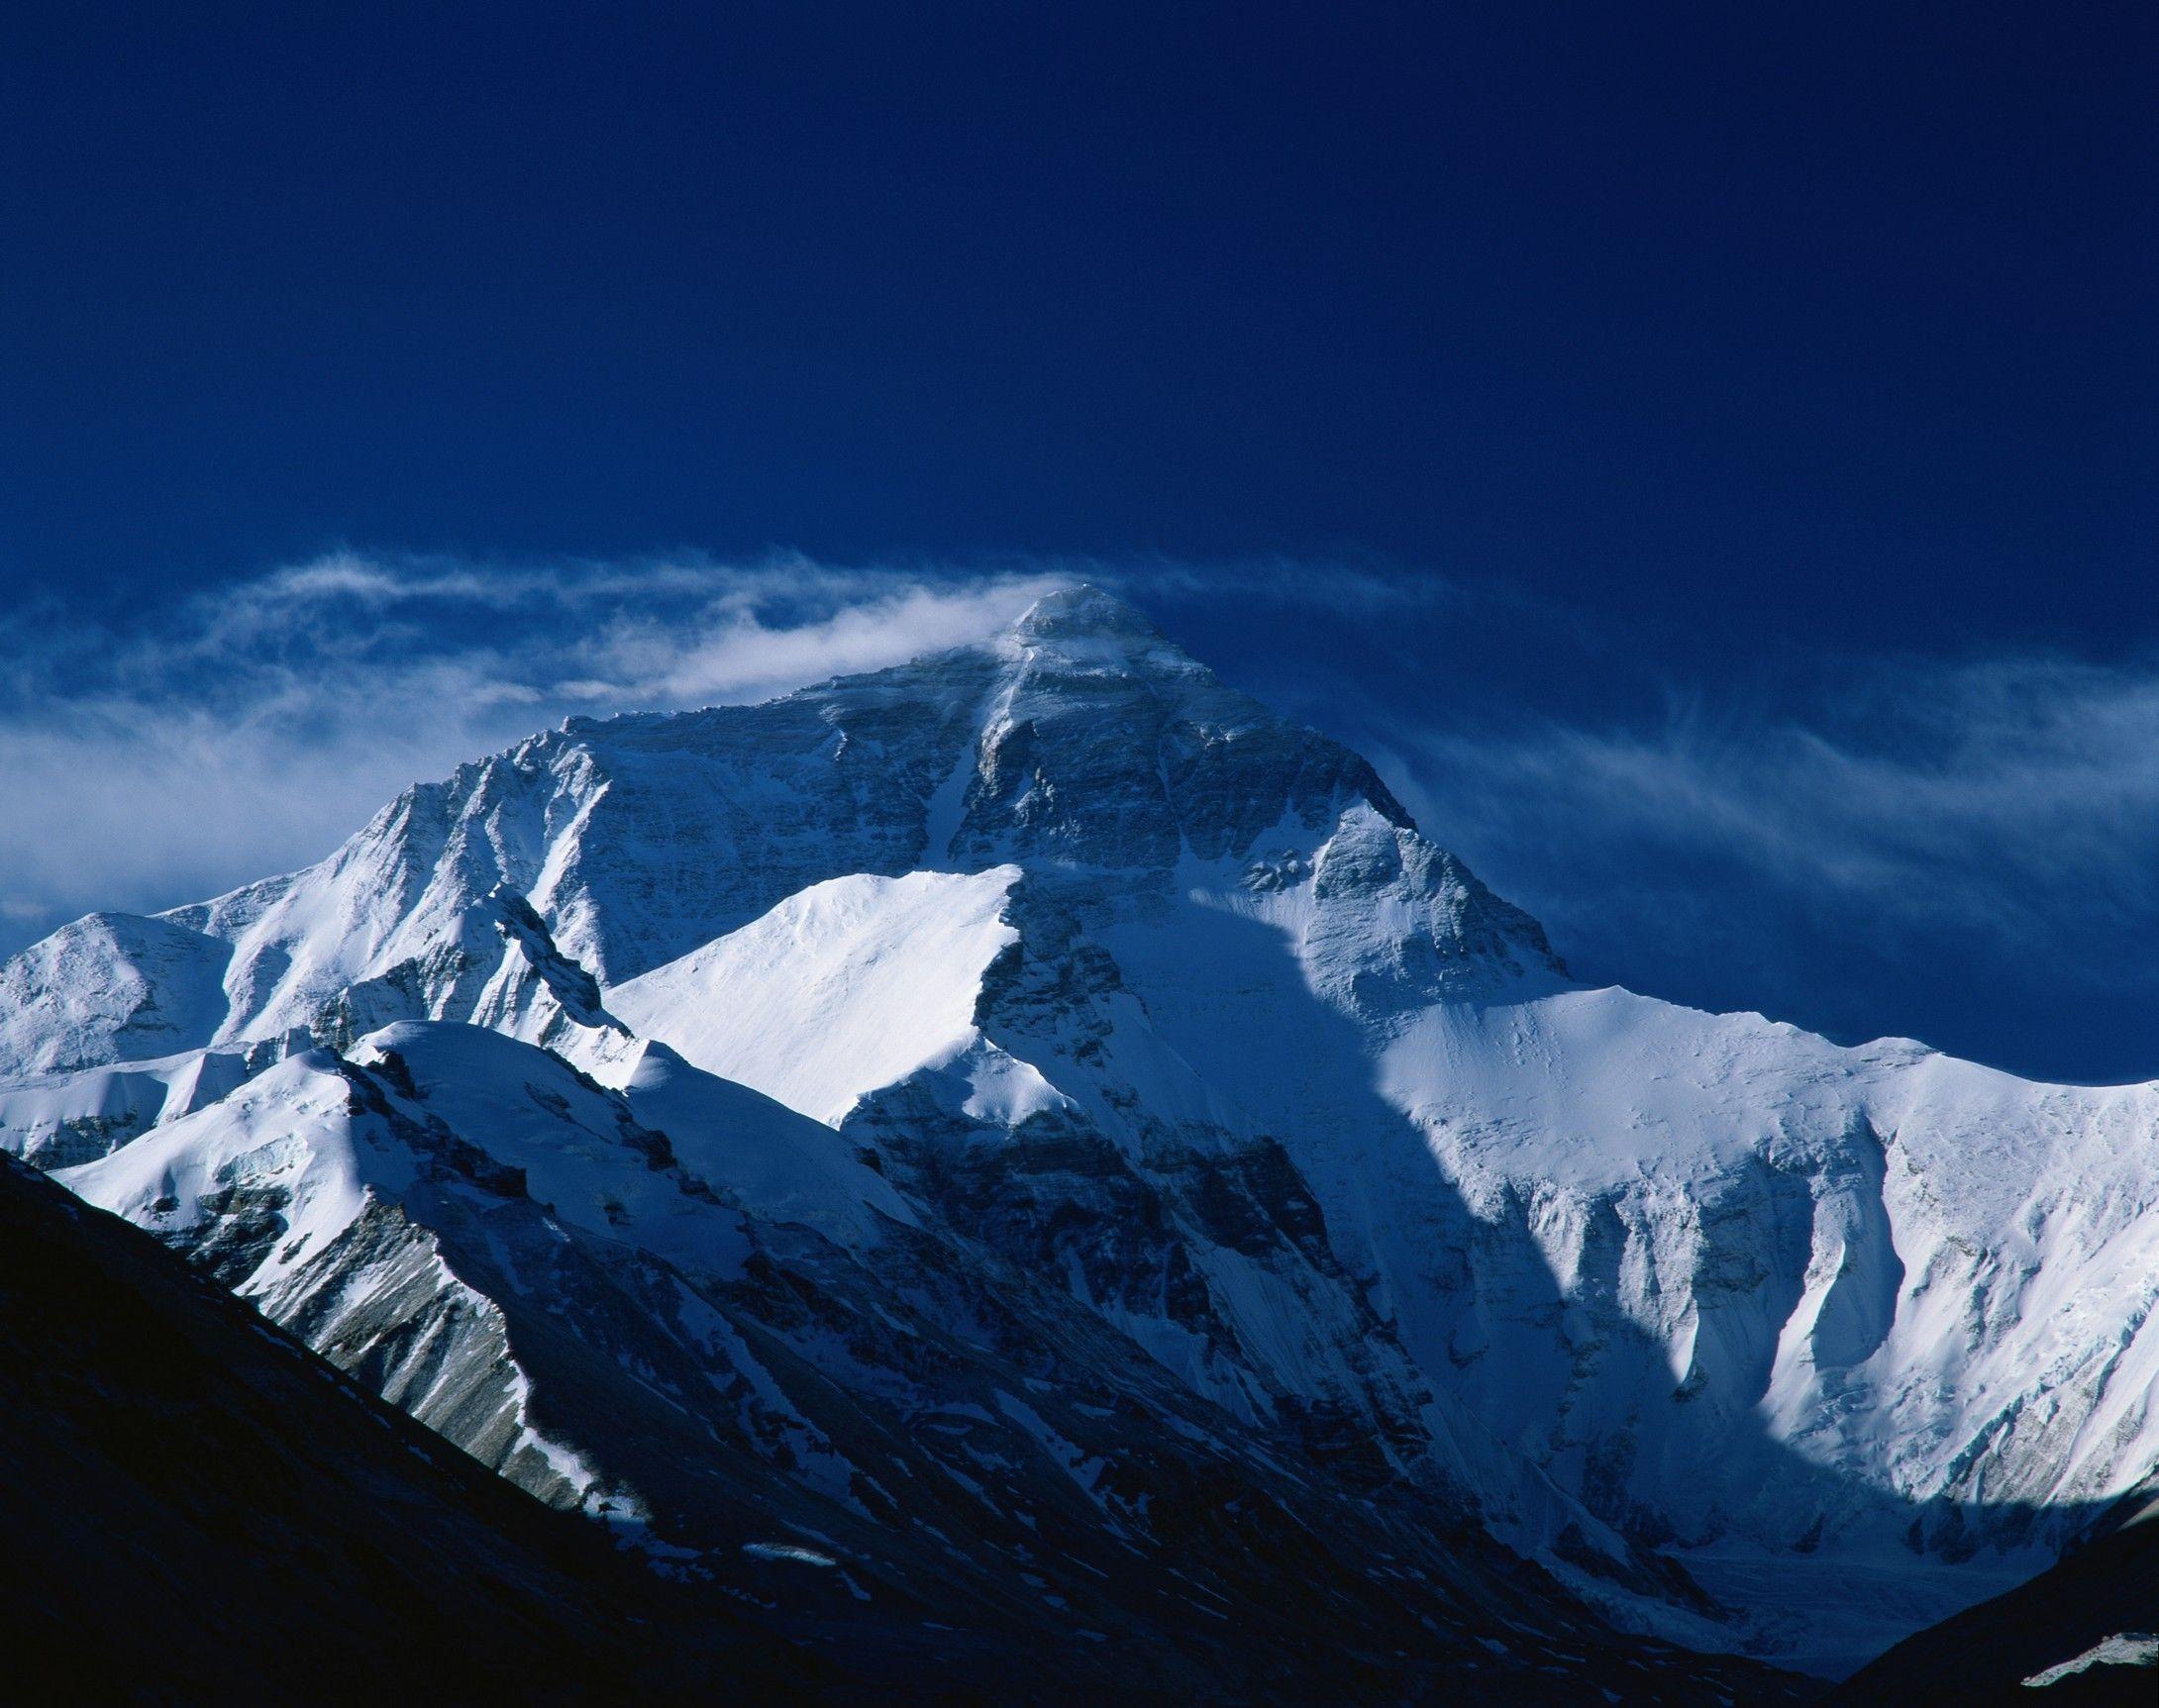 Everest wallpapers wallpaper cave - Mount everest wallpaper ...